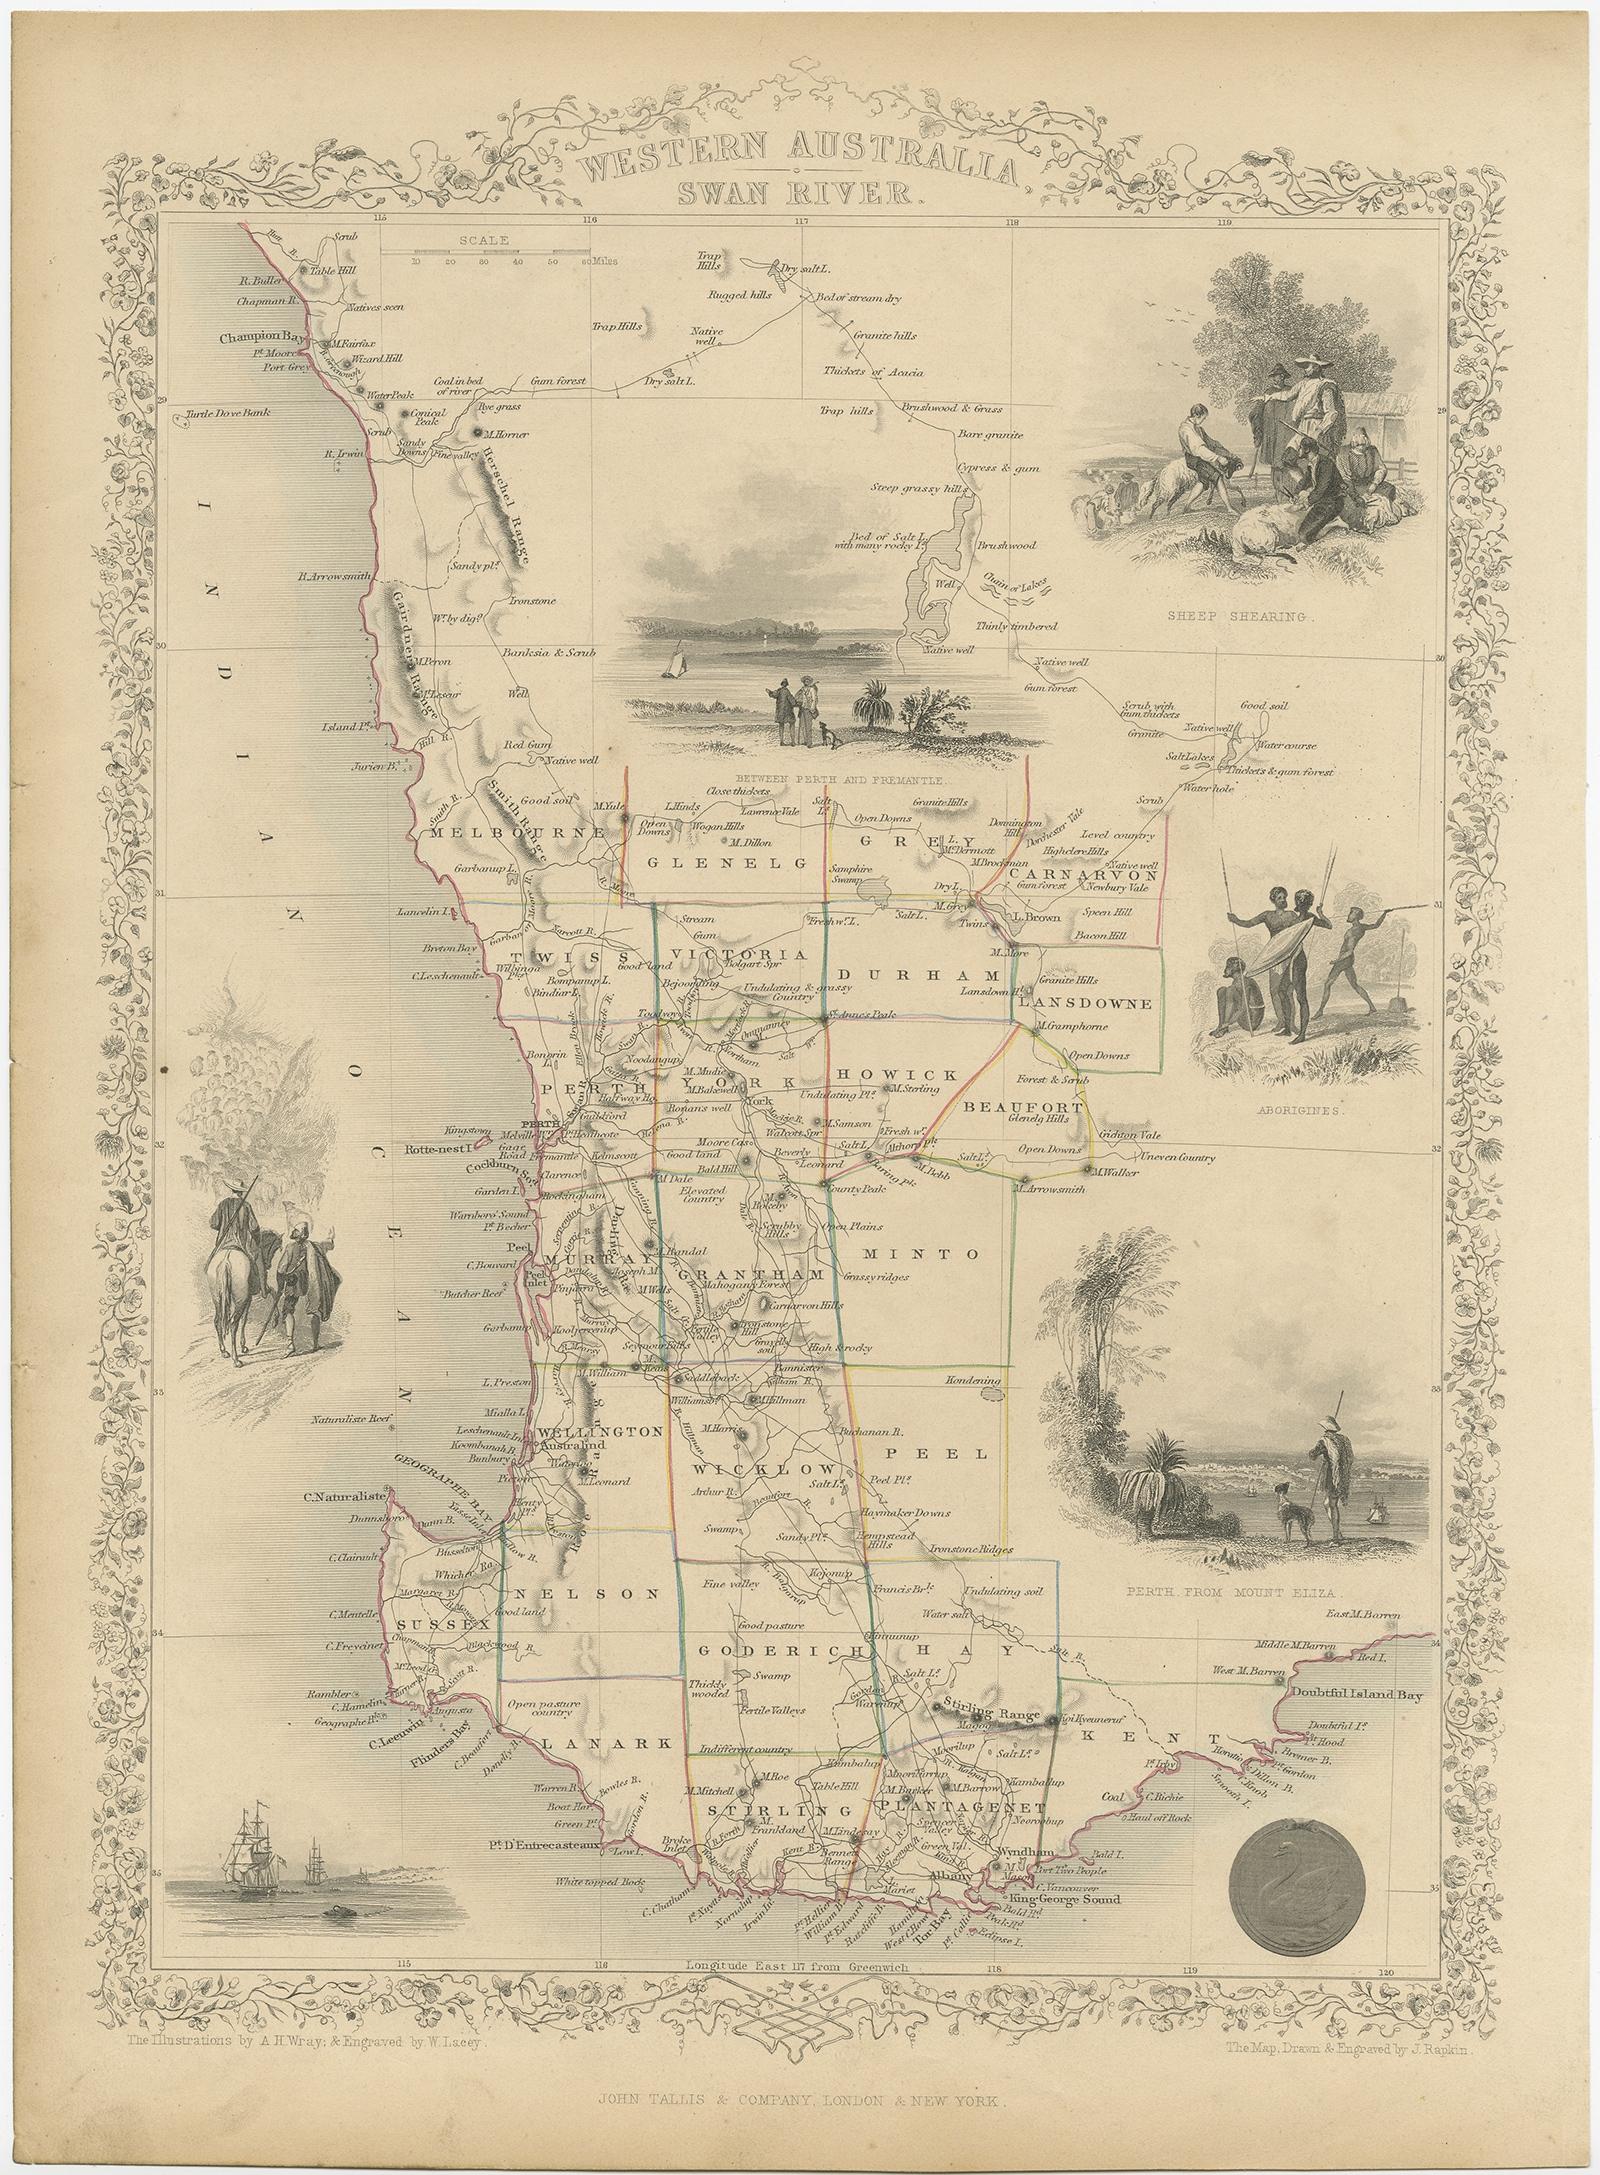 Australia Map 1850.Western Australia Swan River Tallis C 1850